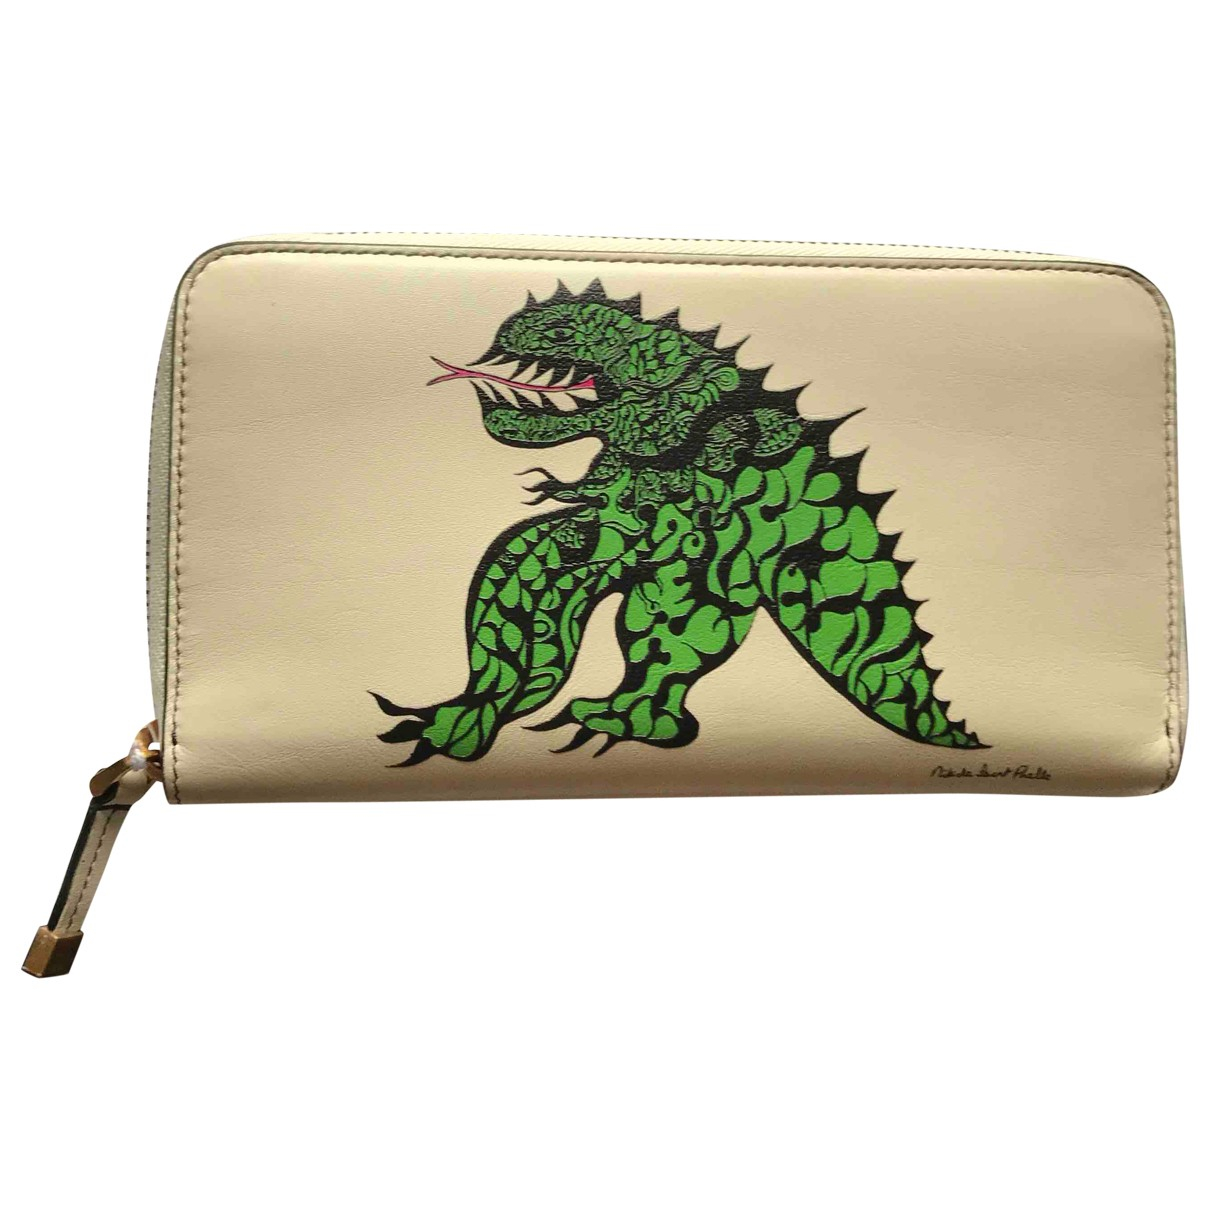 Dior \N Ecru Leather wallet for Women \N